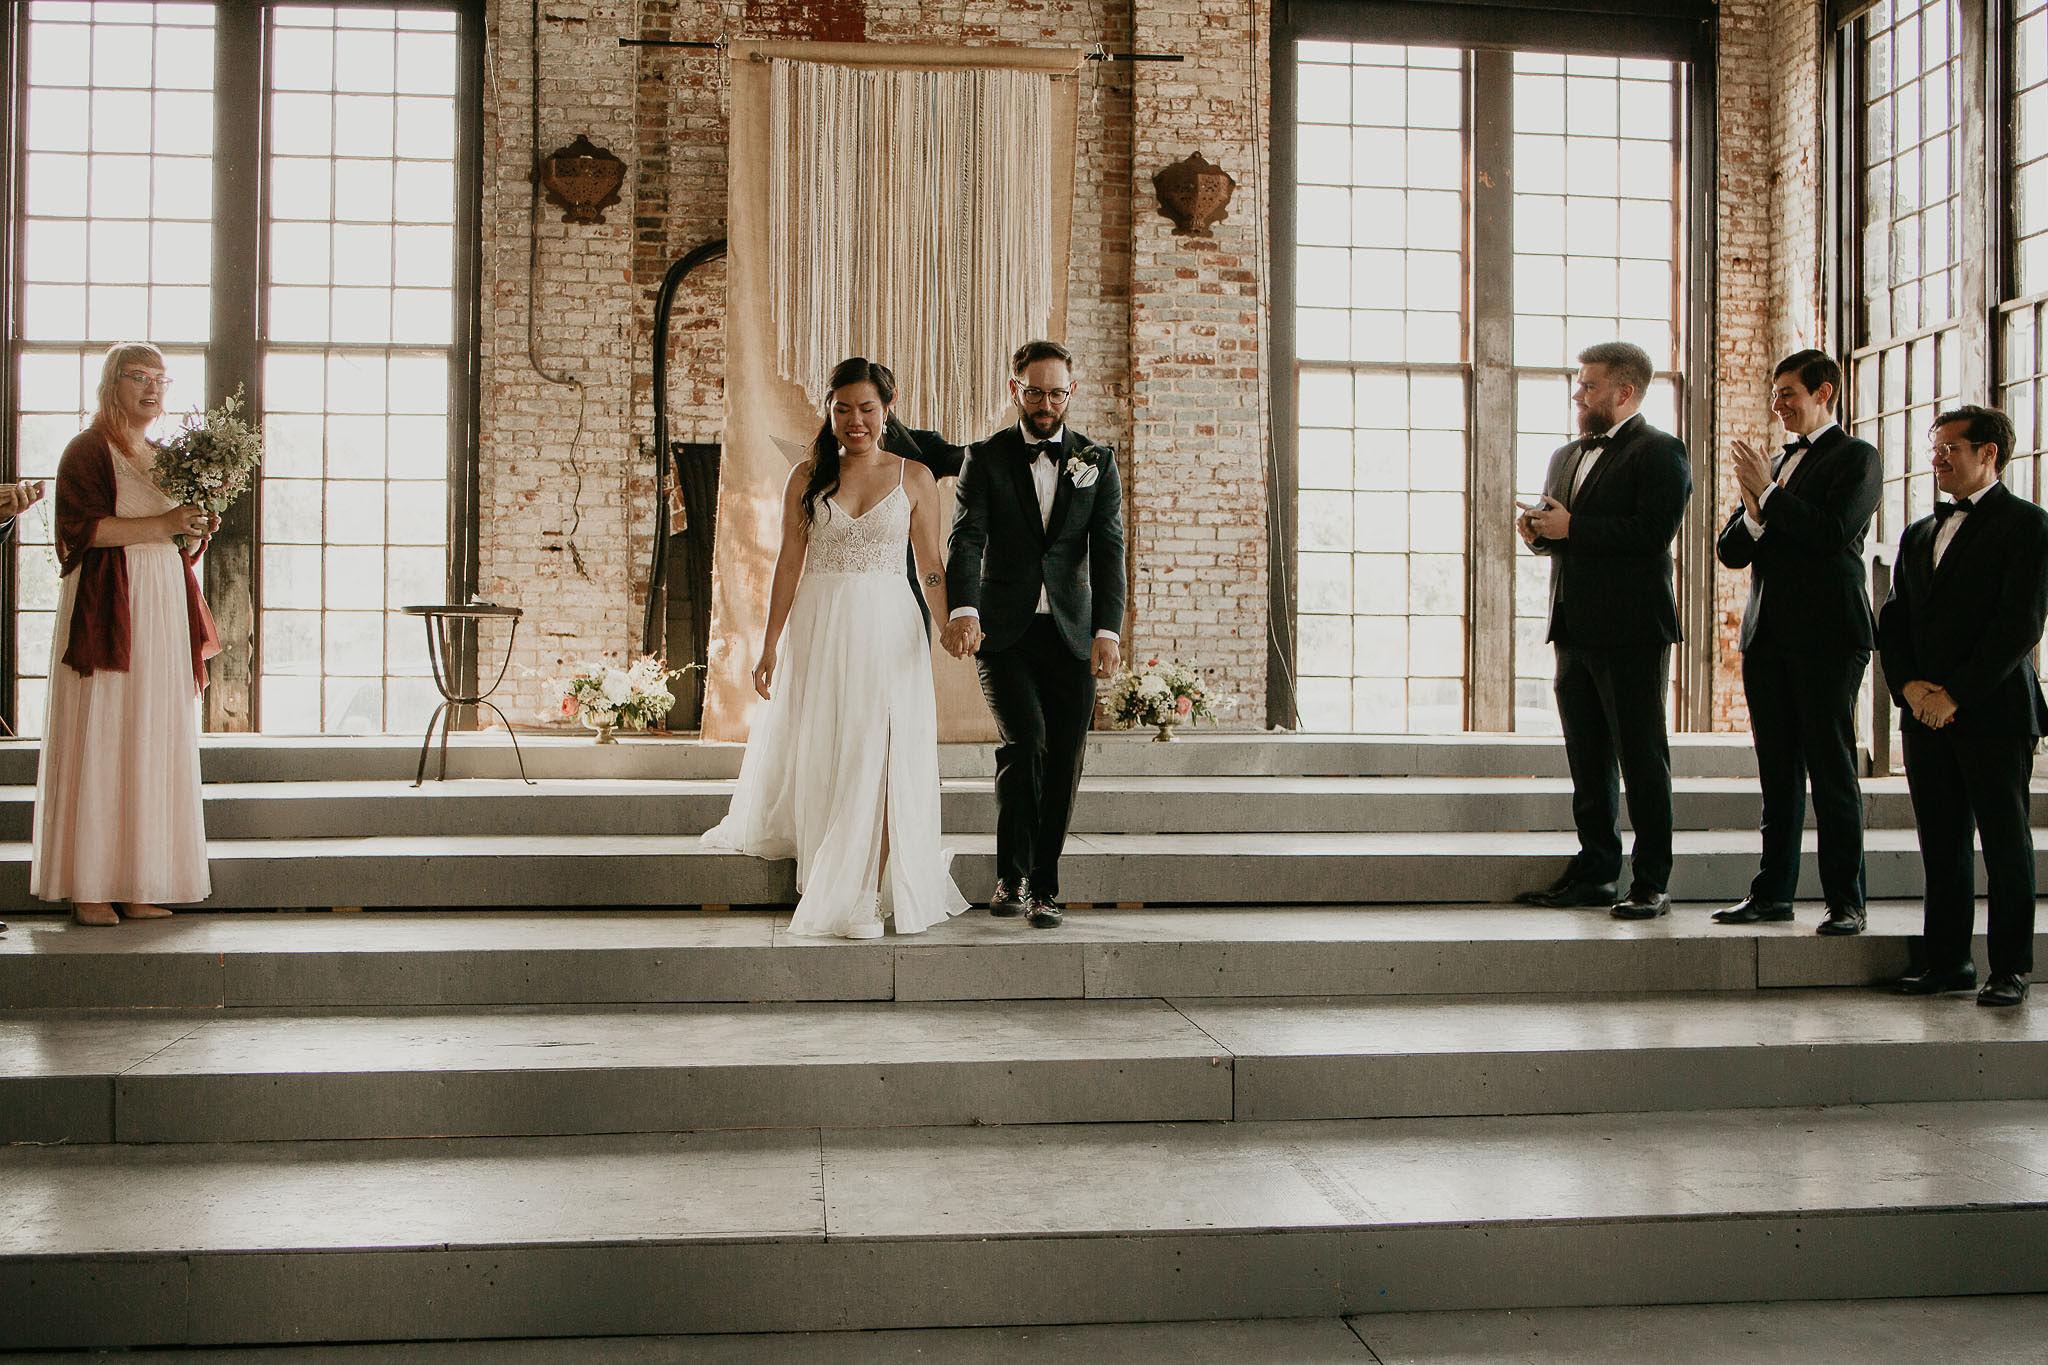 Jess+Matt_wedding-274.JPG